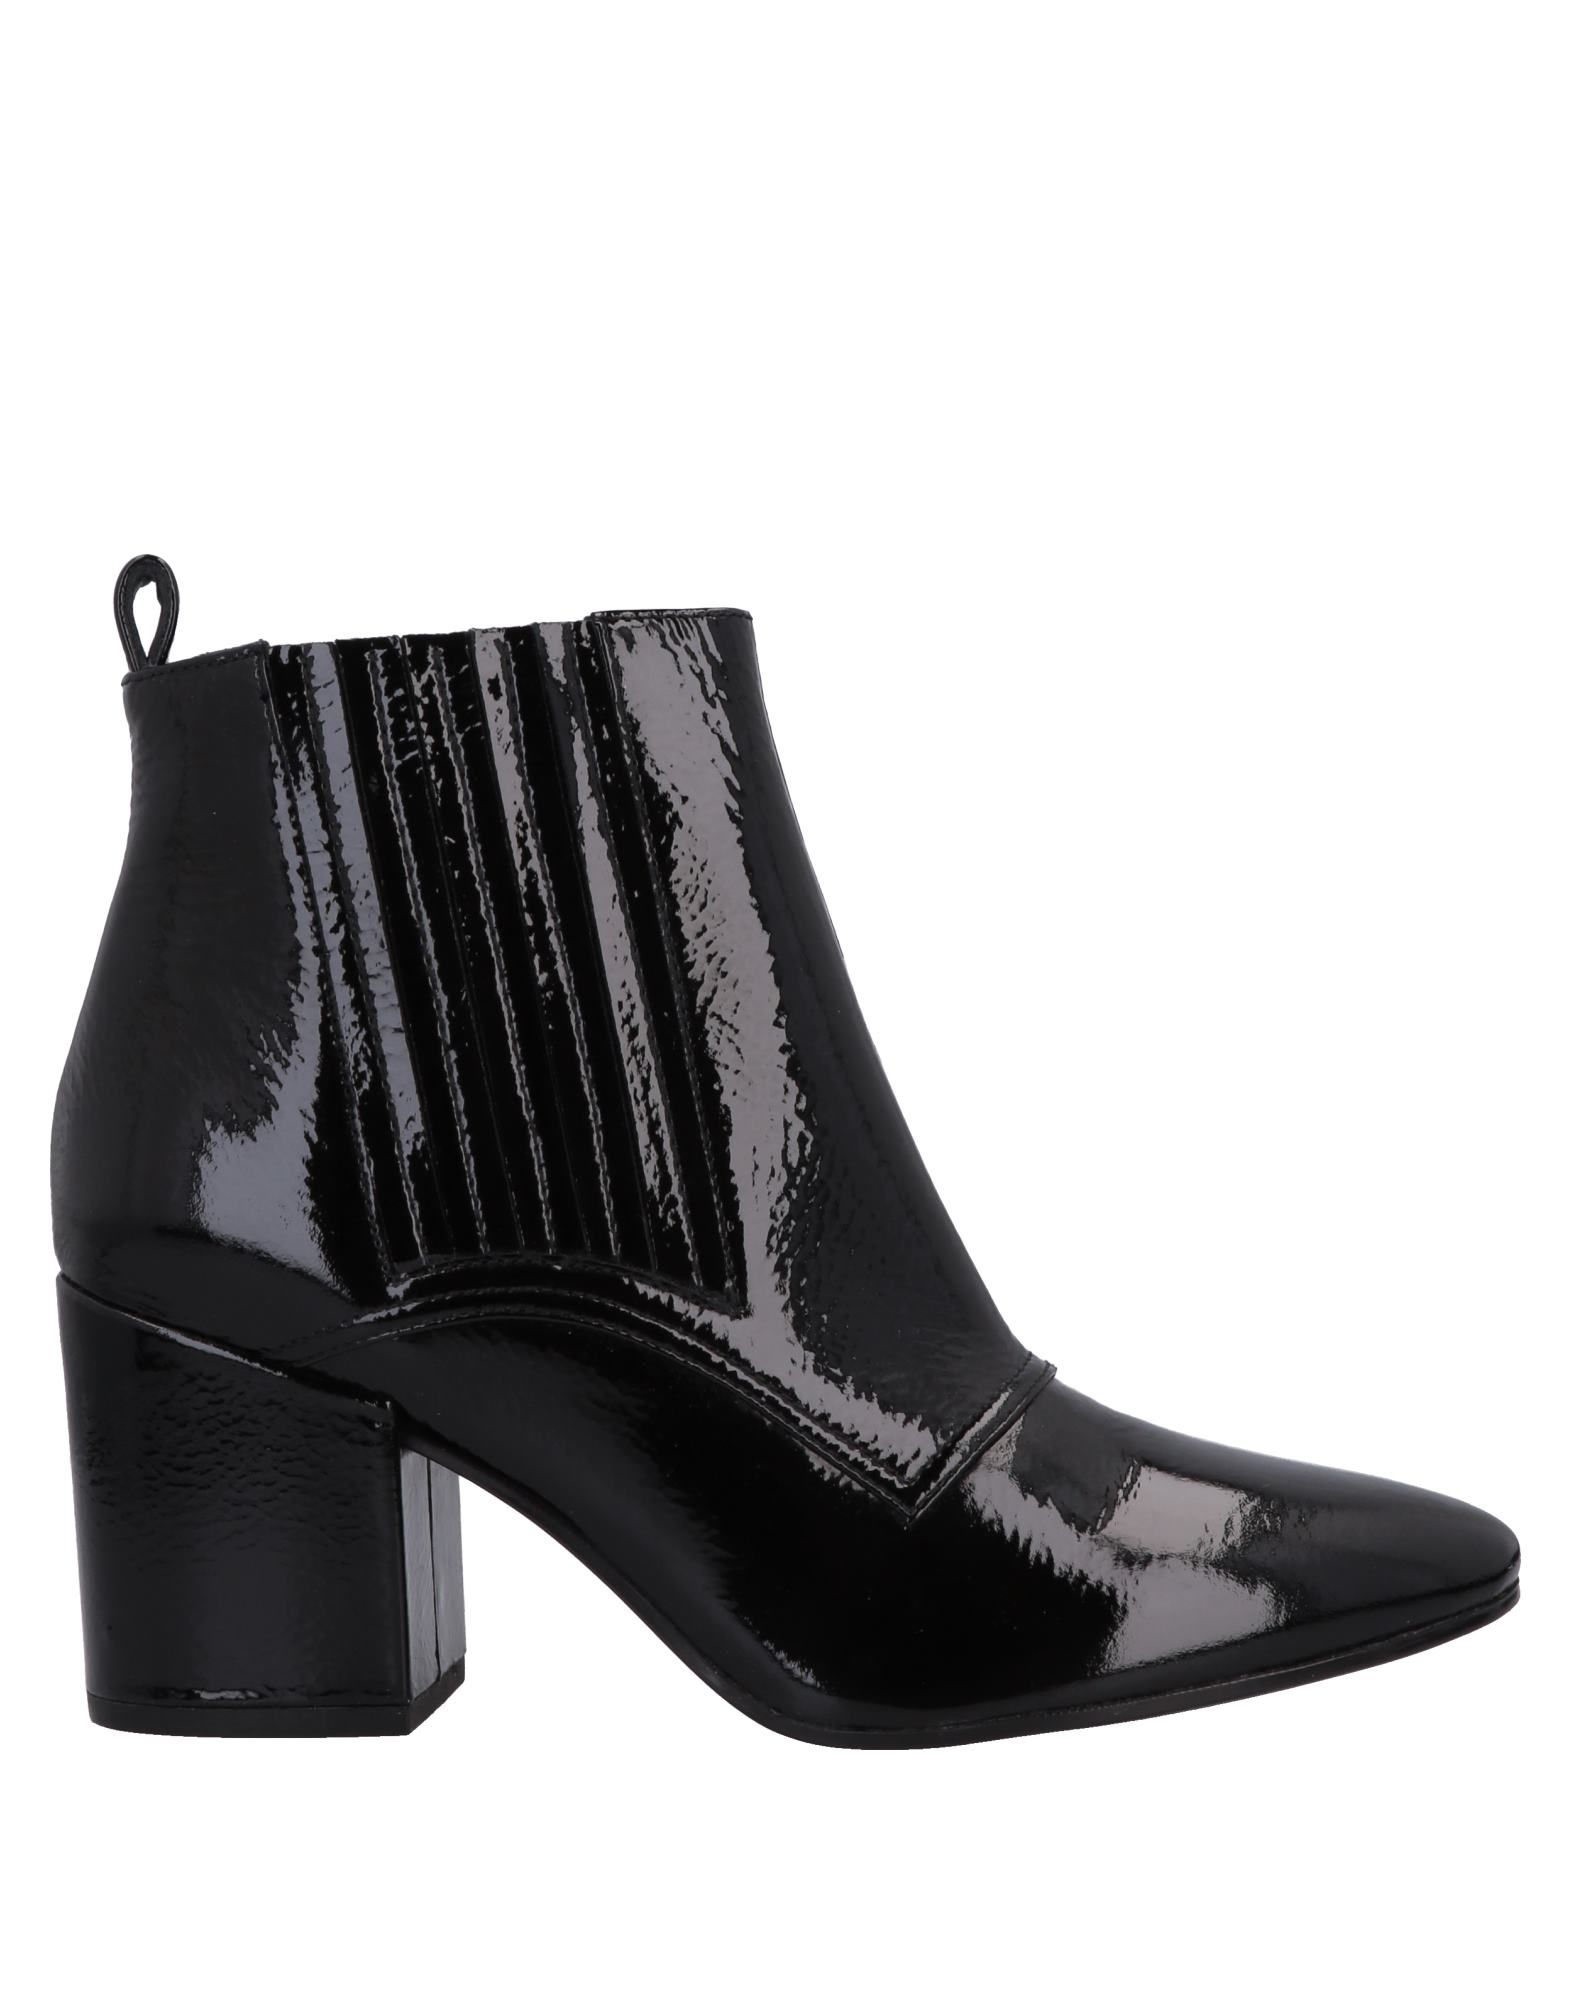 BRUNO PREMI Полусапоги и высокие ботинки bruno magli полусапоги и высокие ботинки